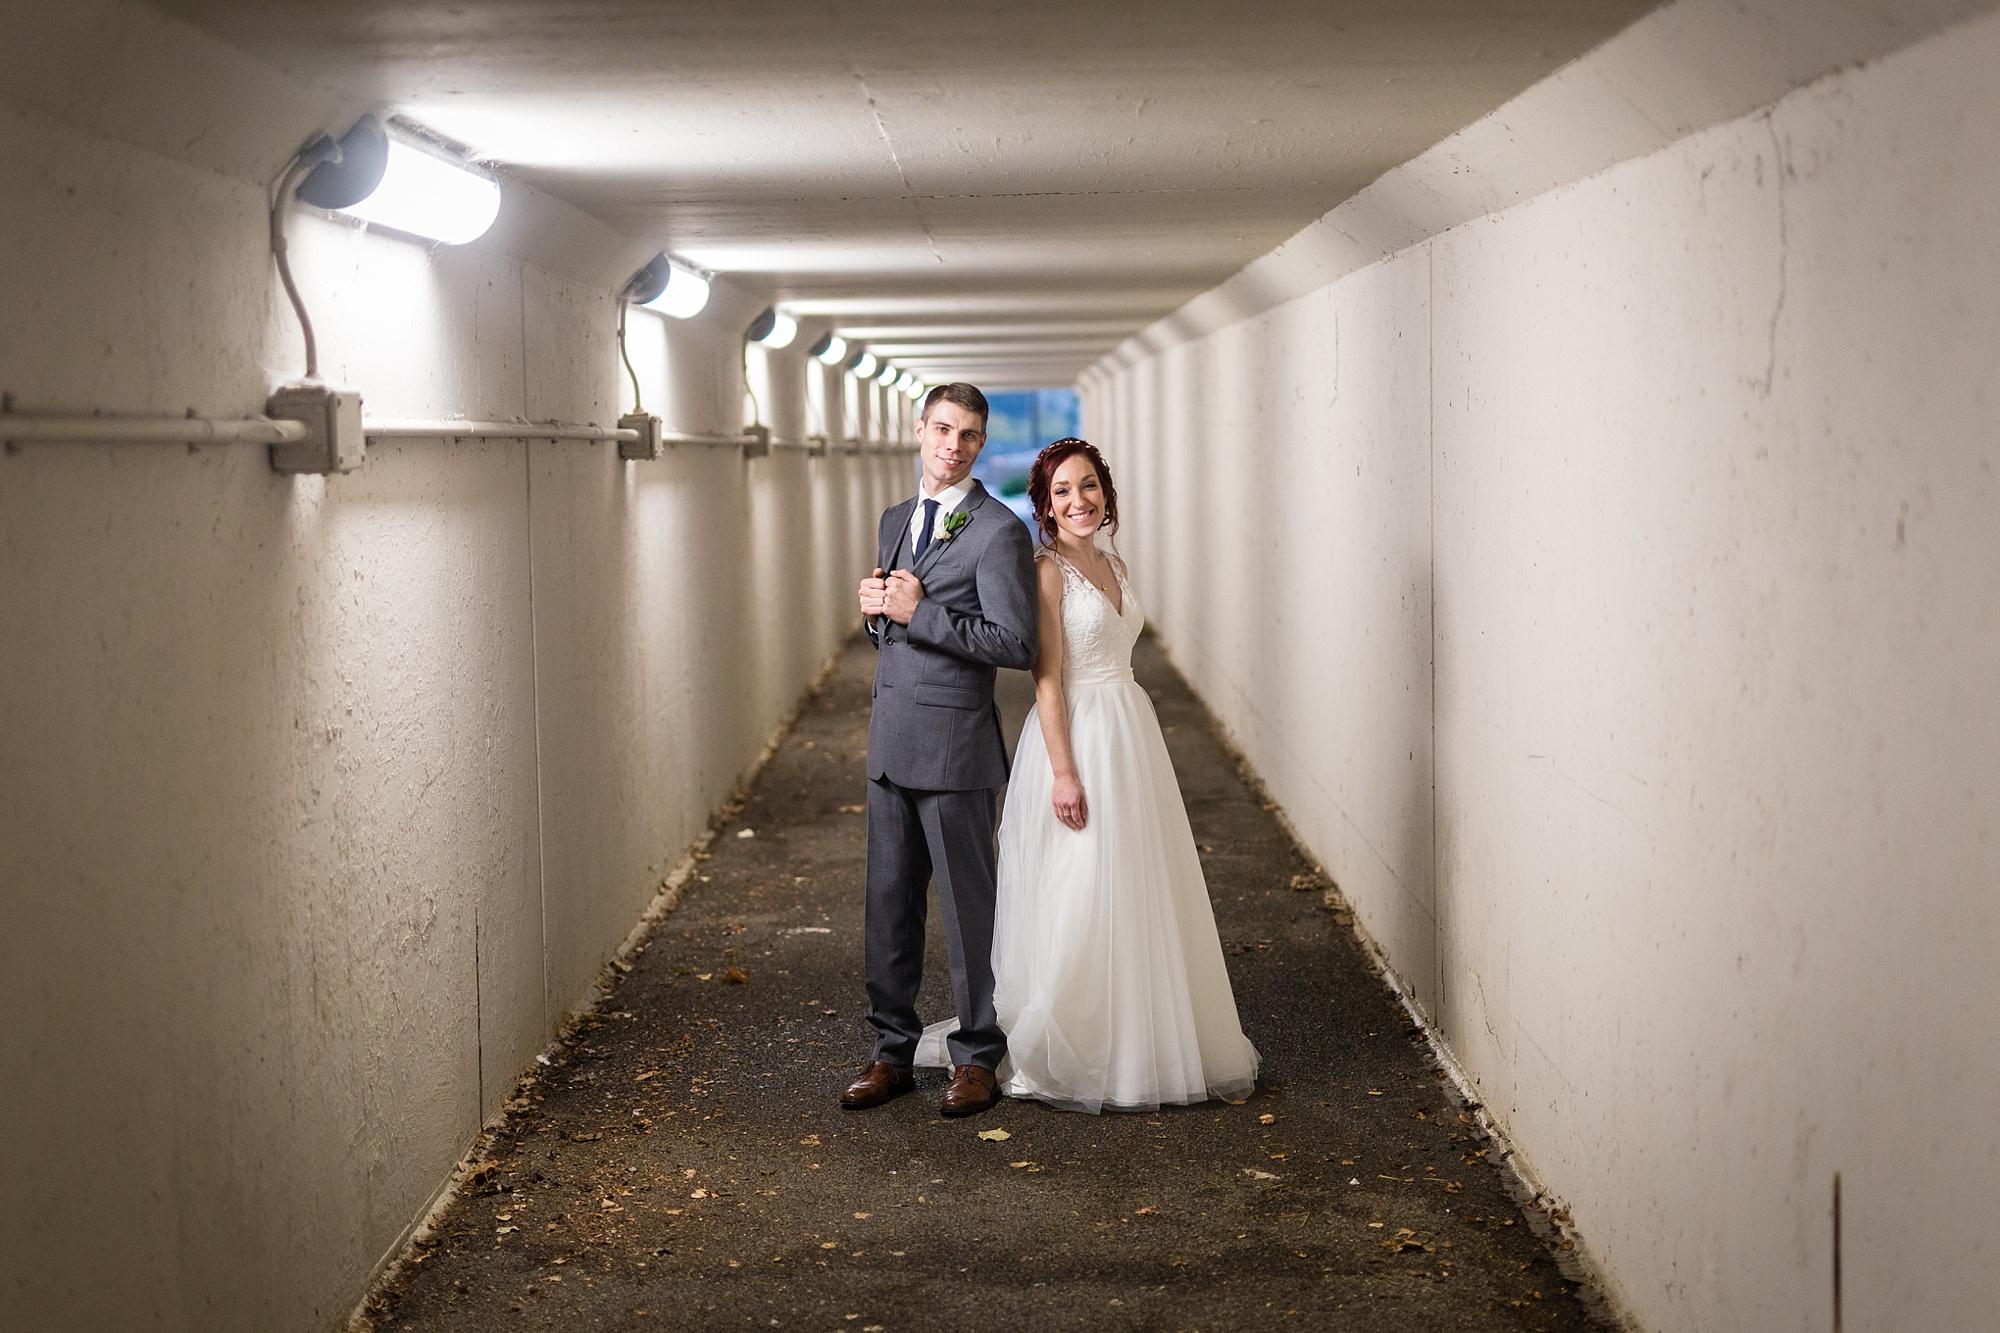 Brandon_Shafer_Photography_Lauren_Ethan_New_Vintage_Place_Grand_Rapids_Wedding_0045.jpg